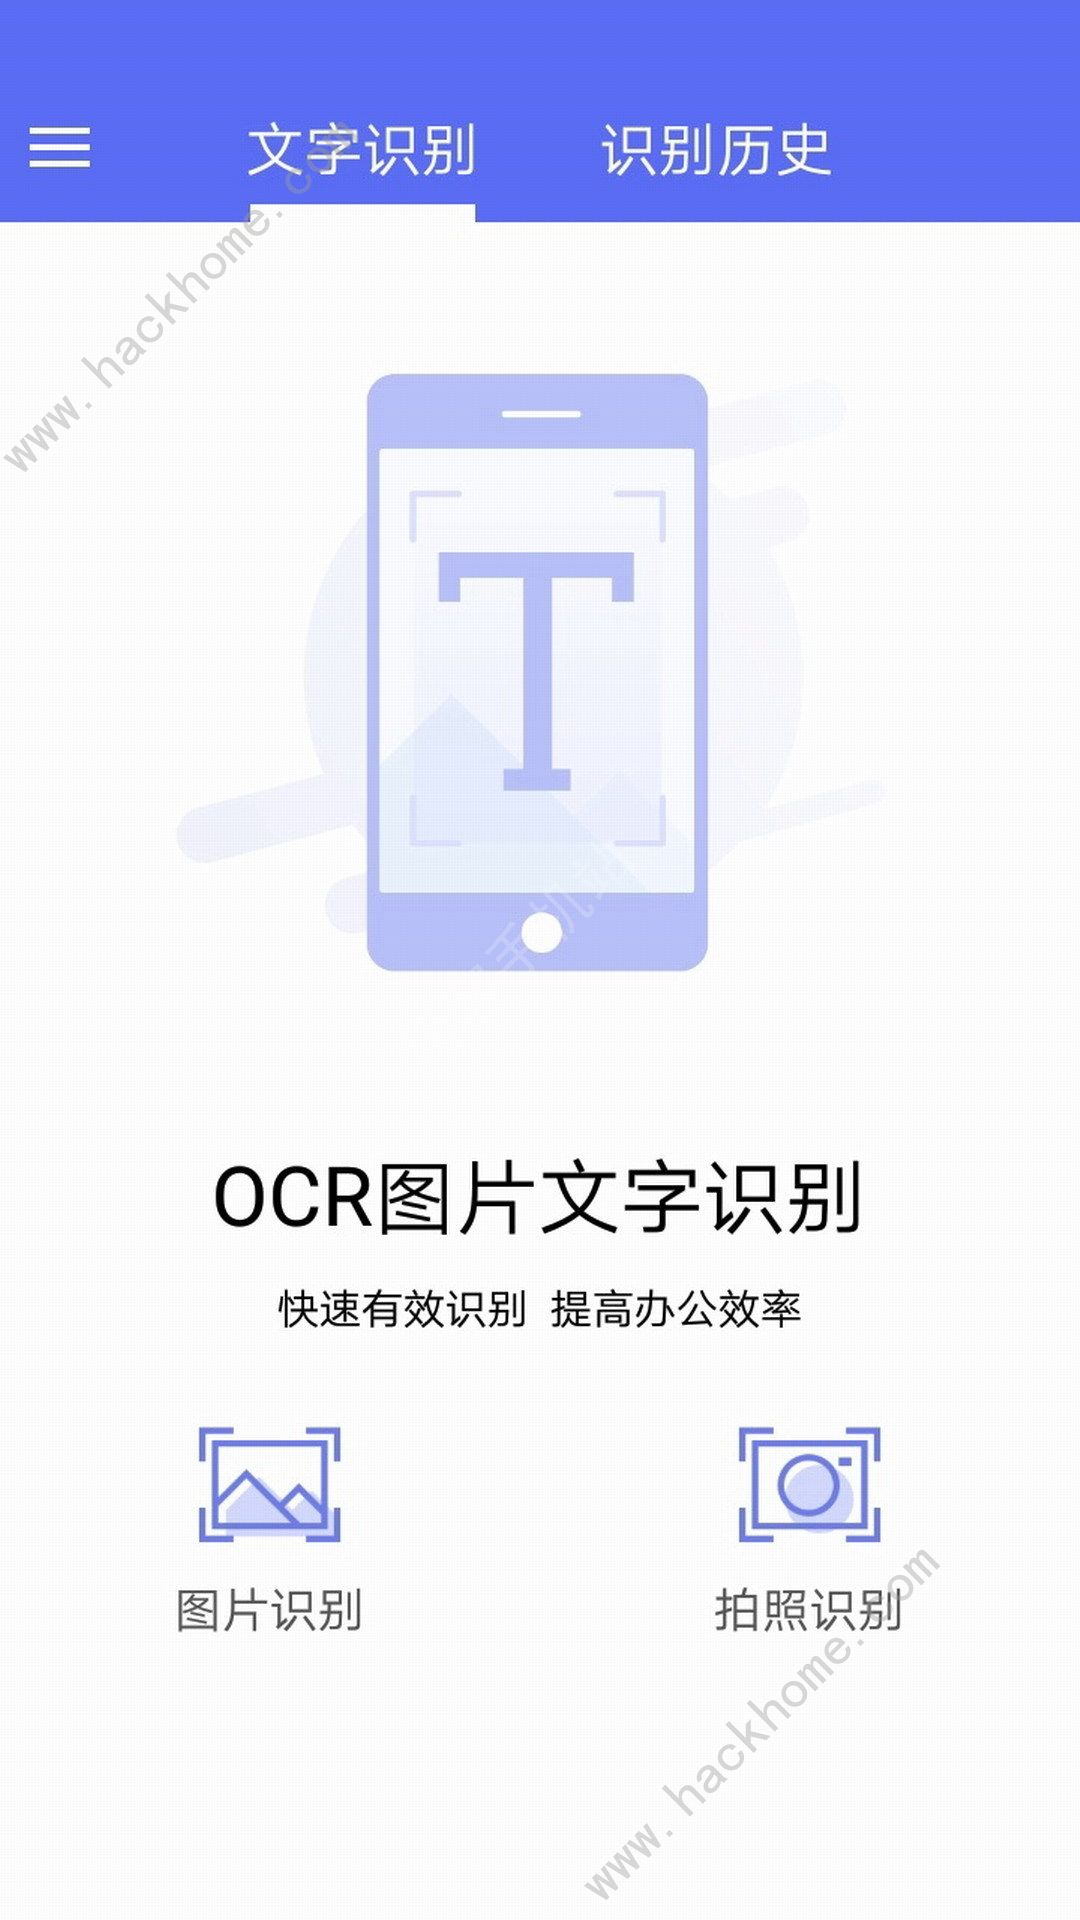 ocr图片文字识别app功能亮点: 1,图片上传经过加密操作,无需担心